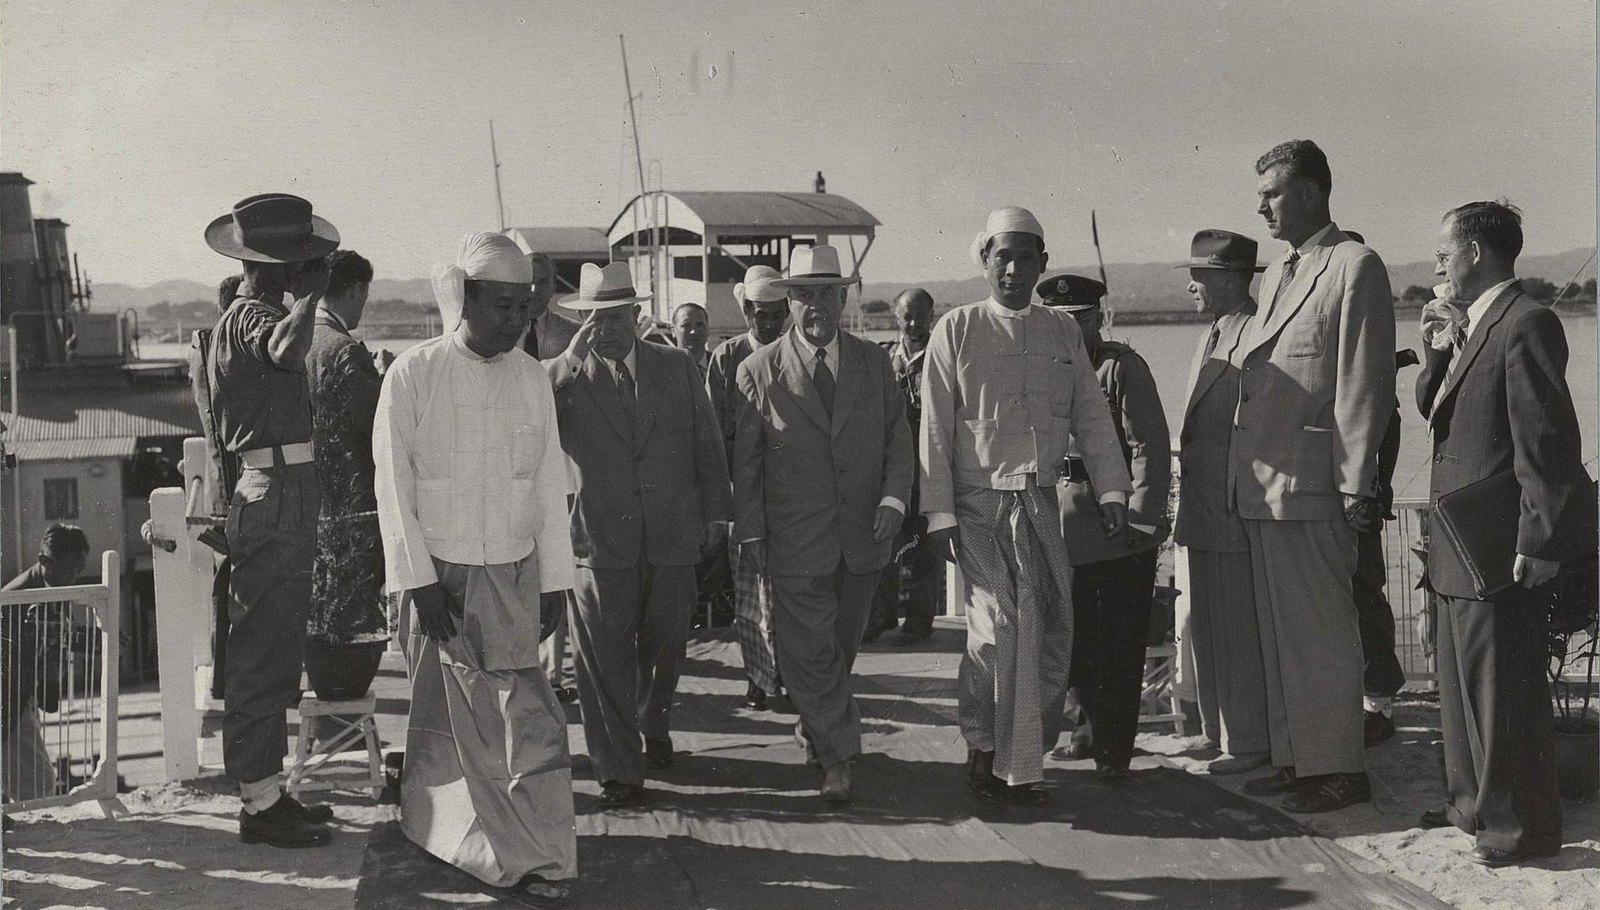 22. Н.С. Хрущёв и Н.А. Булганин на пристани в Мандалае